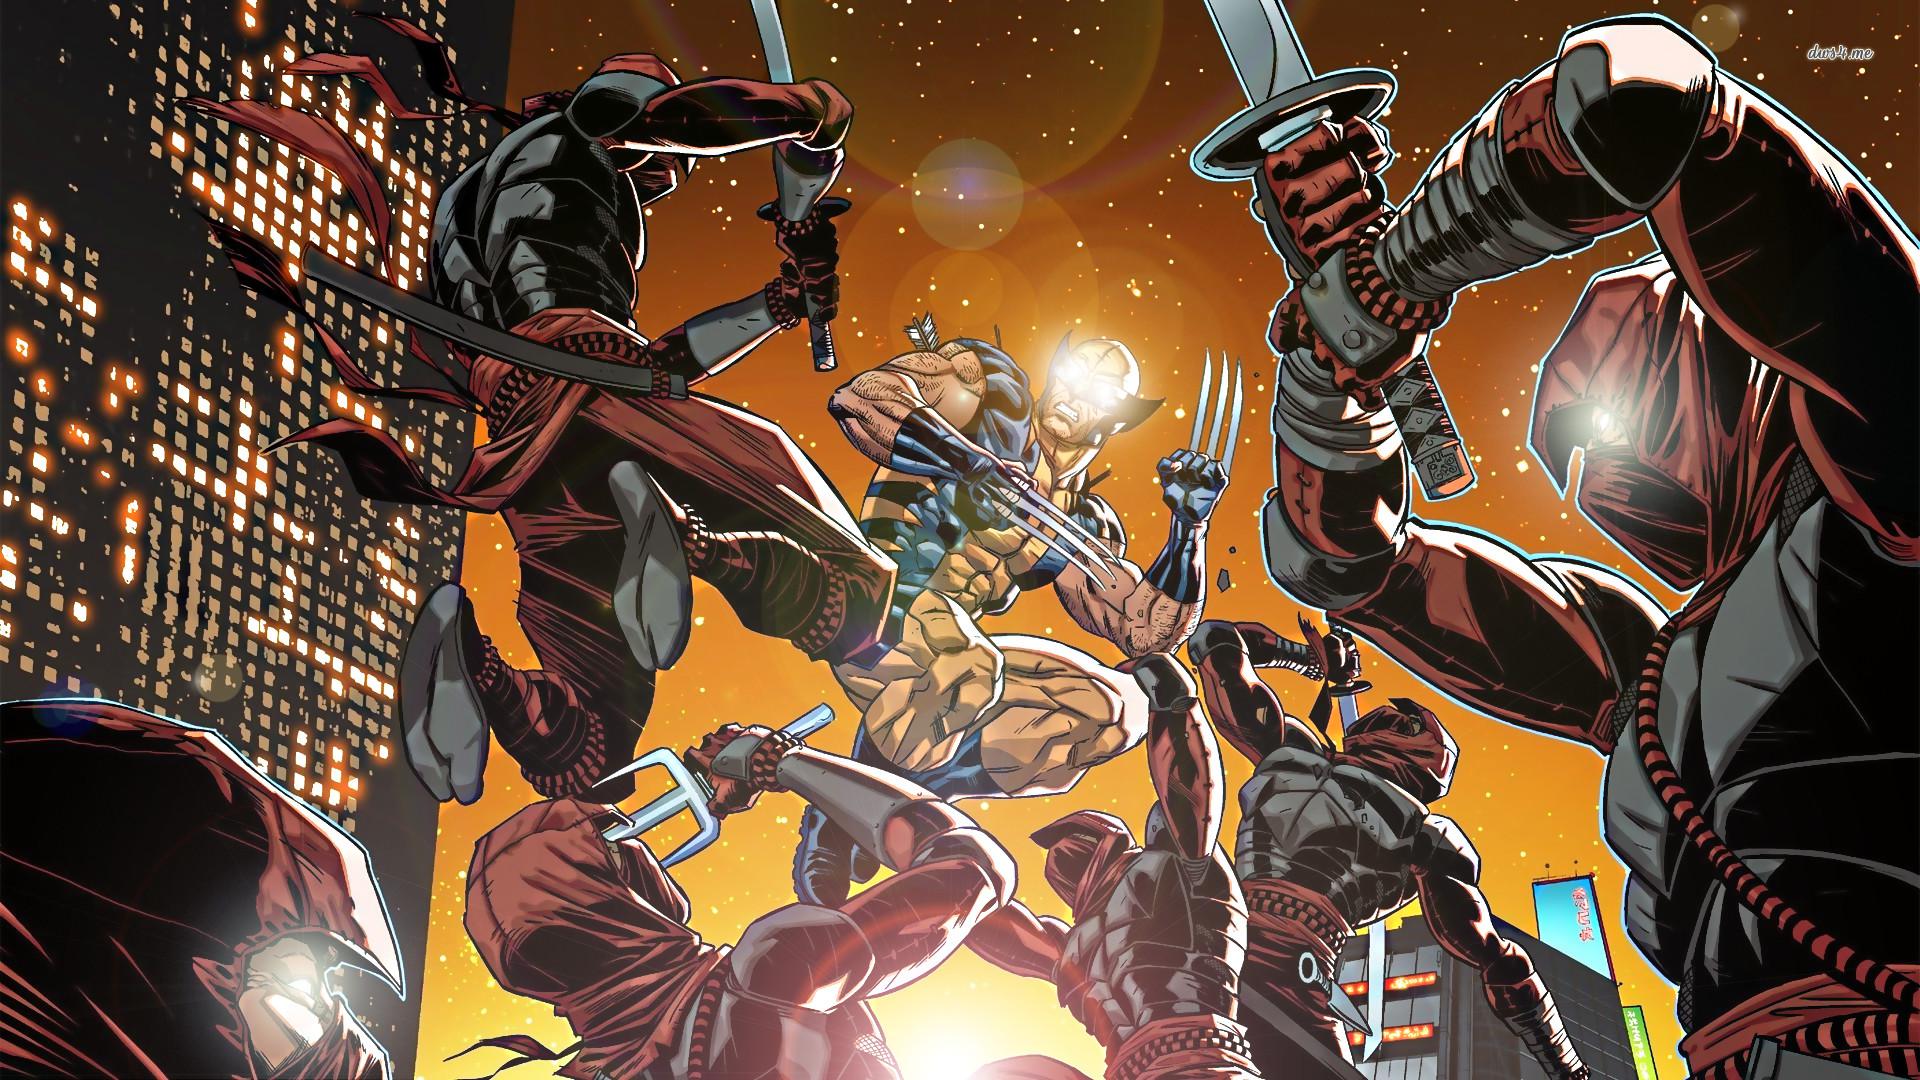 Res: 1920x1080, ... Wolverine wallpaper  ...